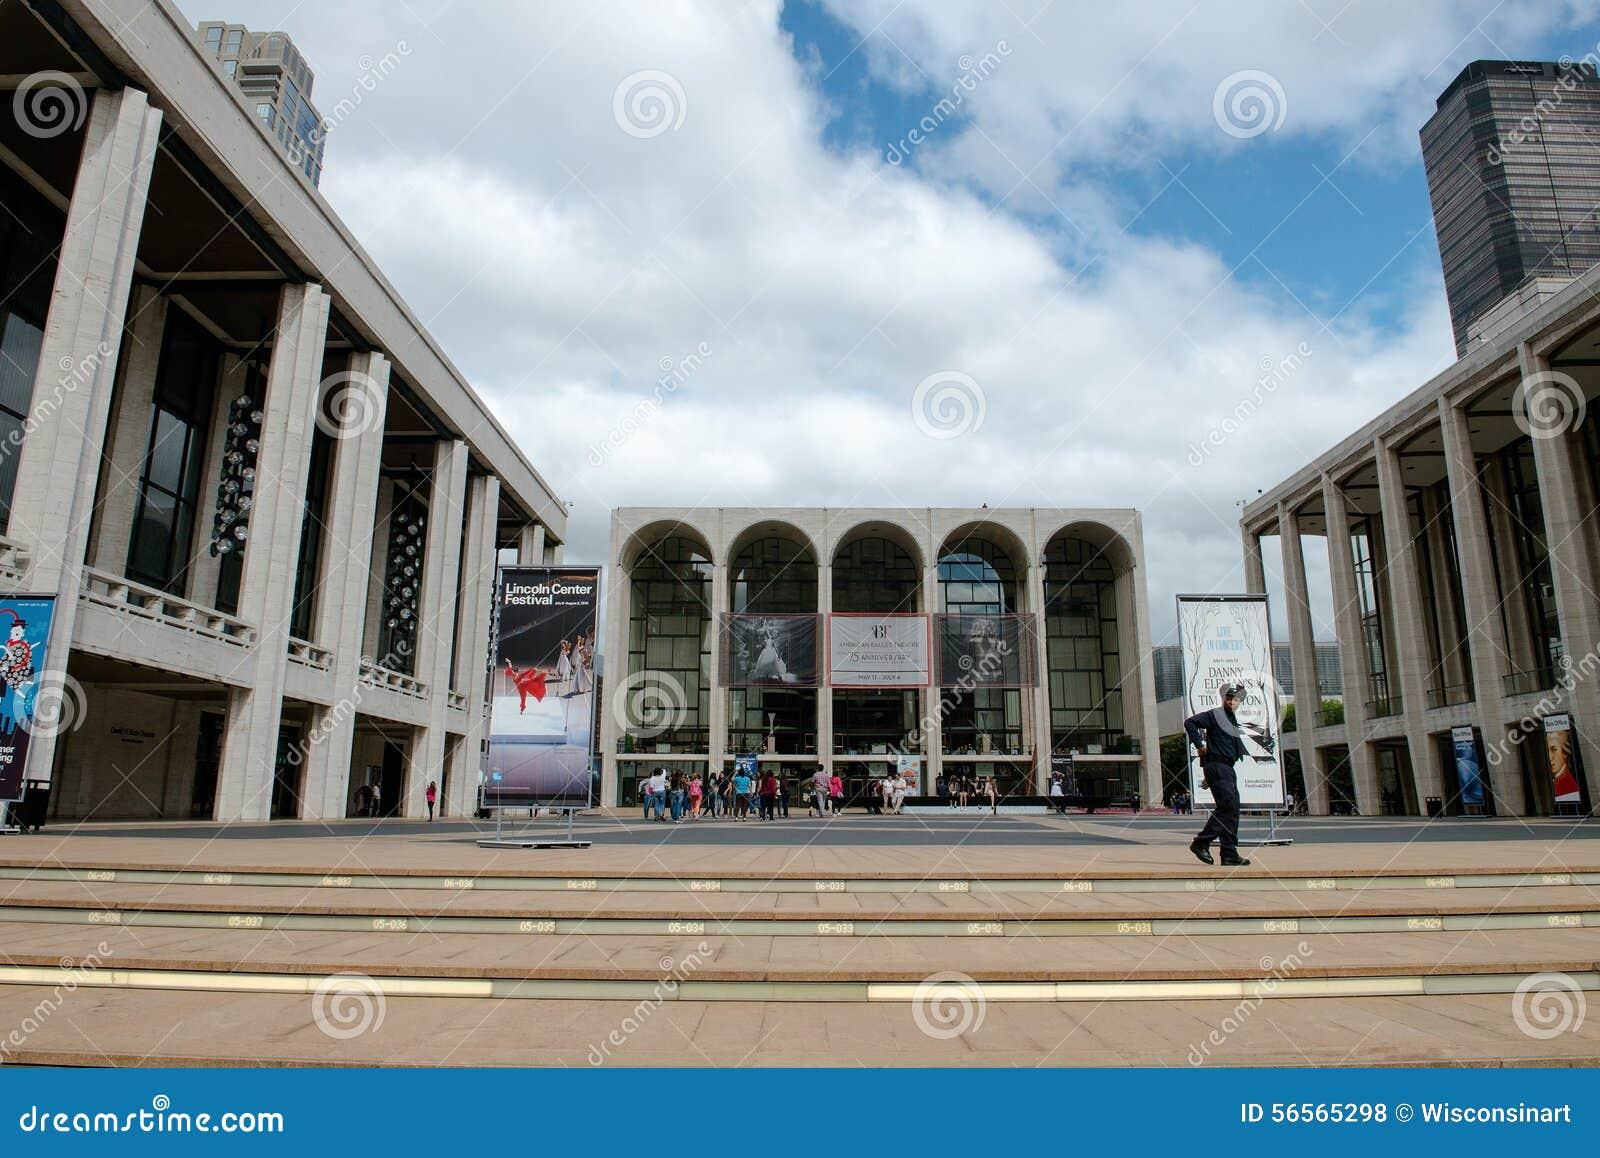 Download Lincoln Center, πόλη της Νέας Υόρκης Εκδοτική Στοκ Εικόνες - εικόνα από πόλη, νέος: 56565298